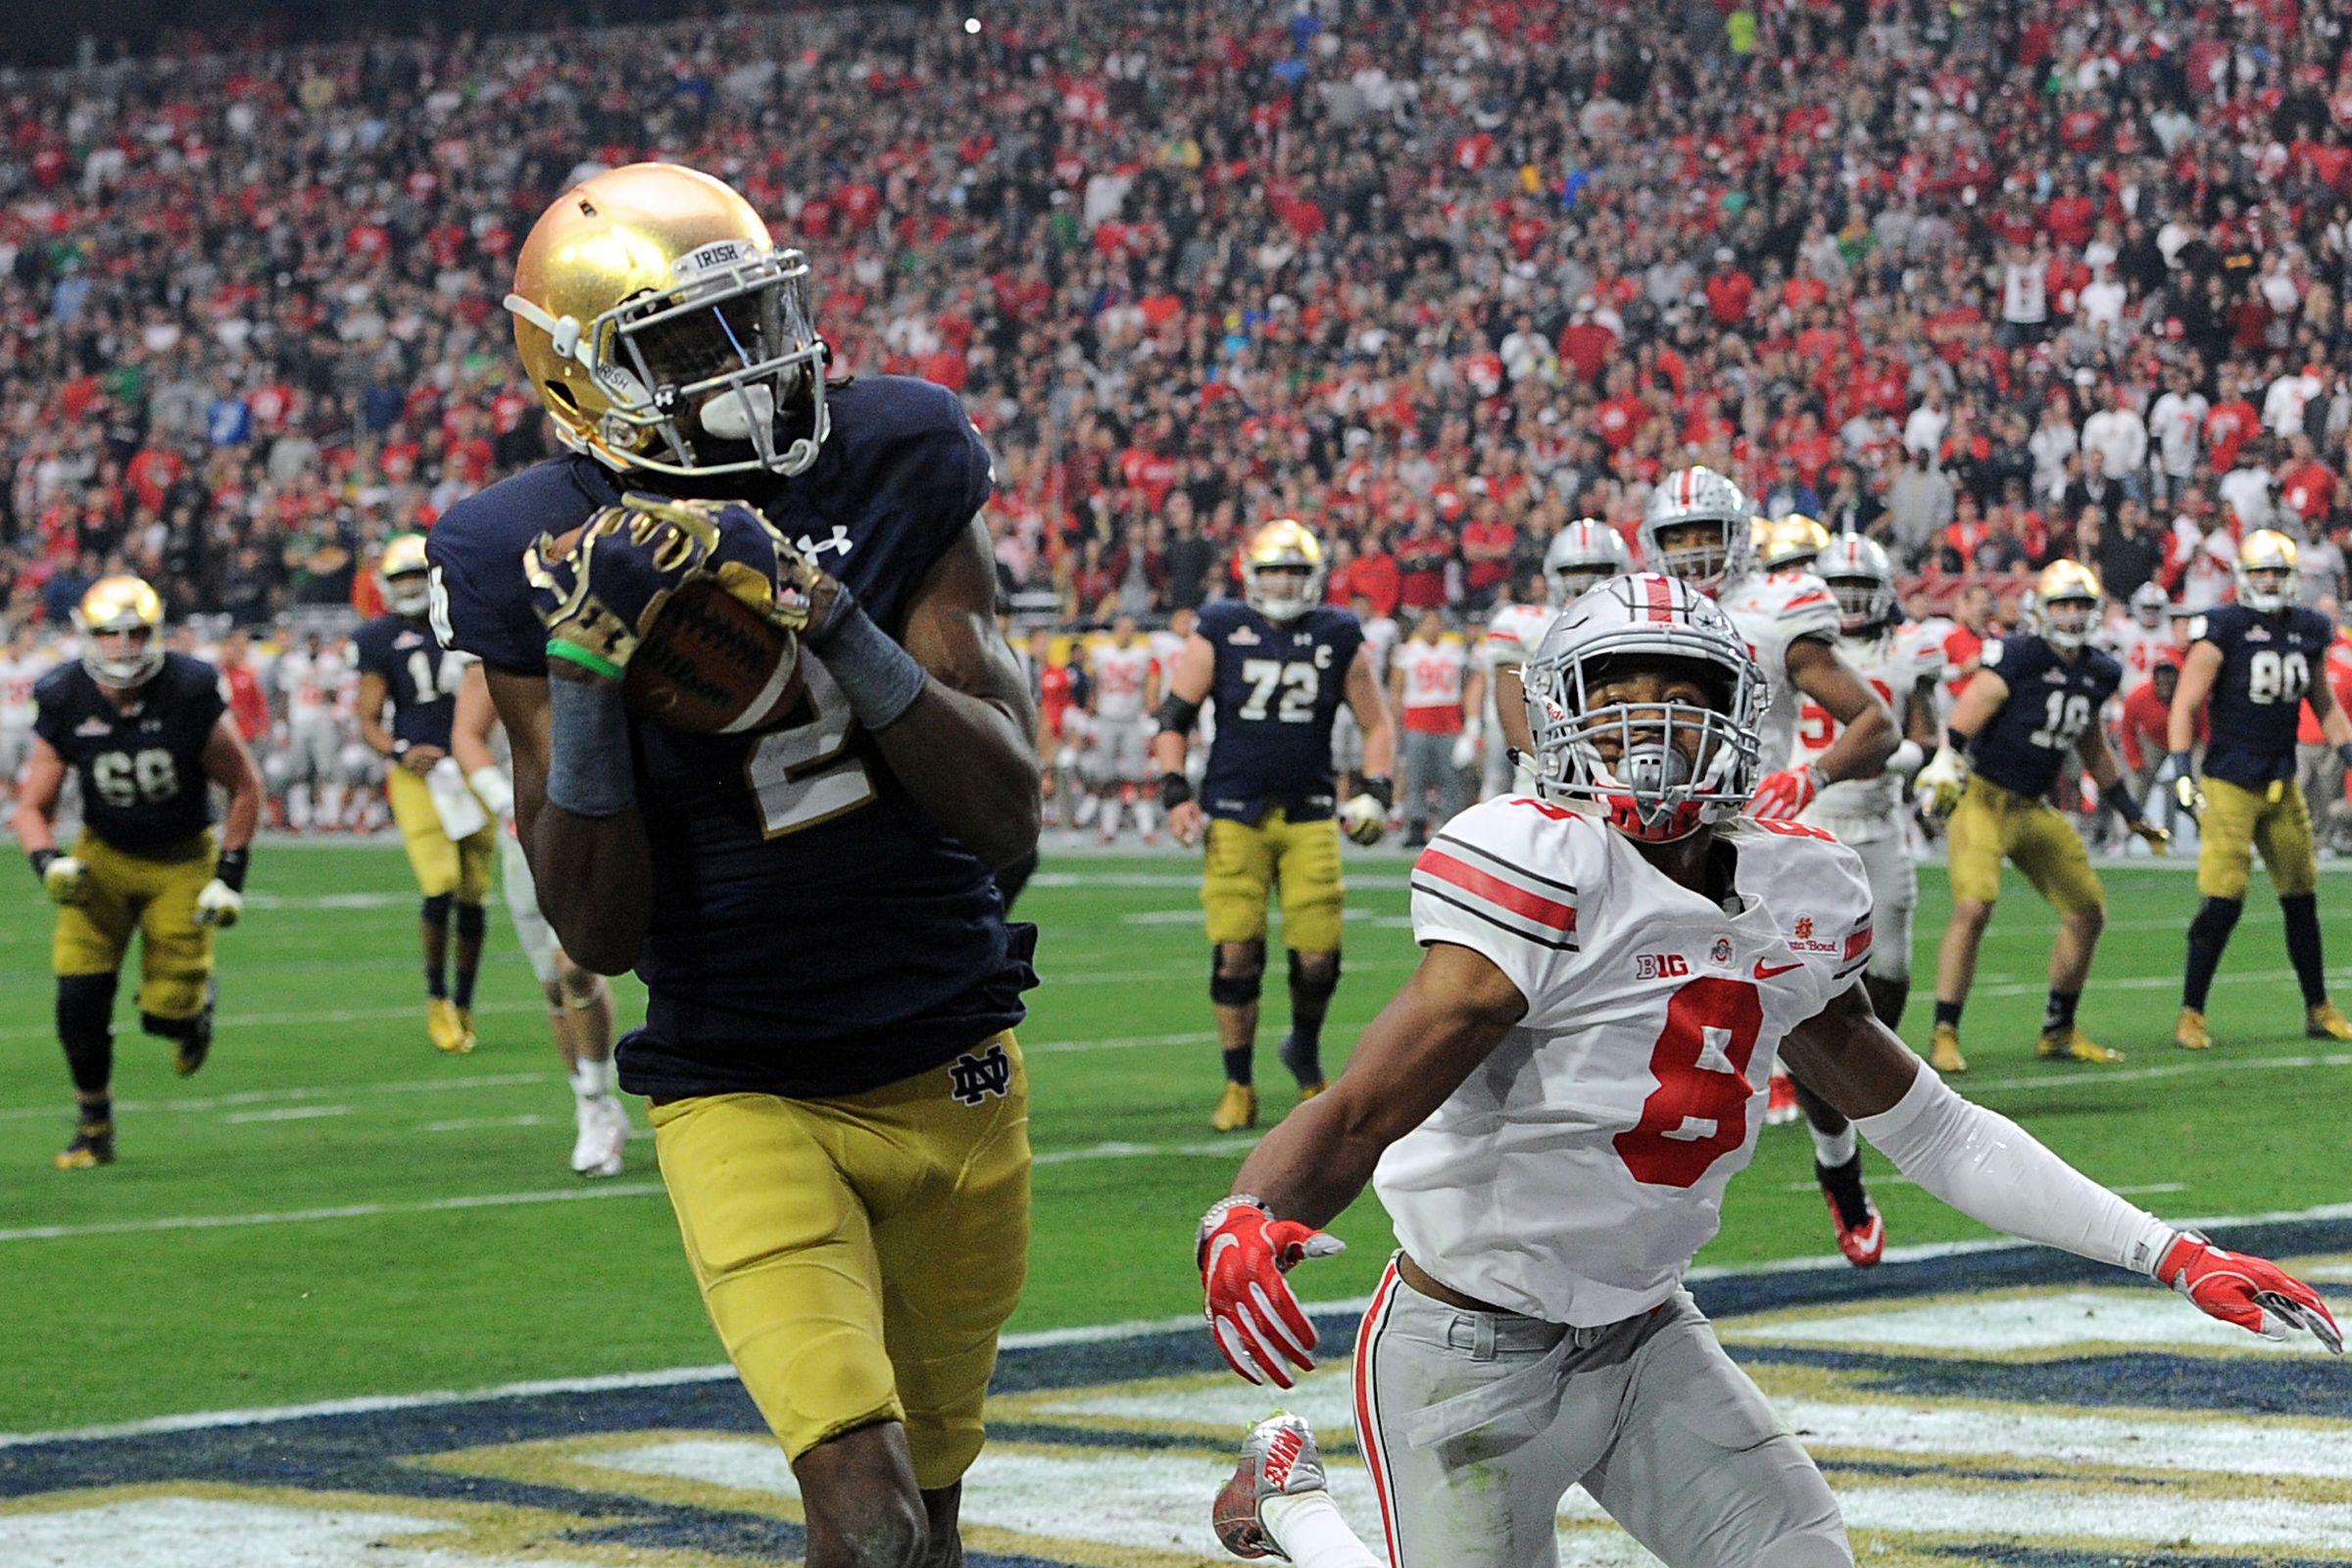 Ohio State vs. Notre Dame: Fiesta Bowl Recap, Score, Key Stats